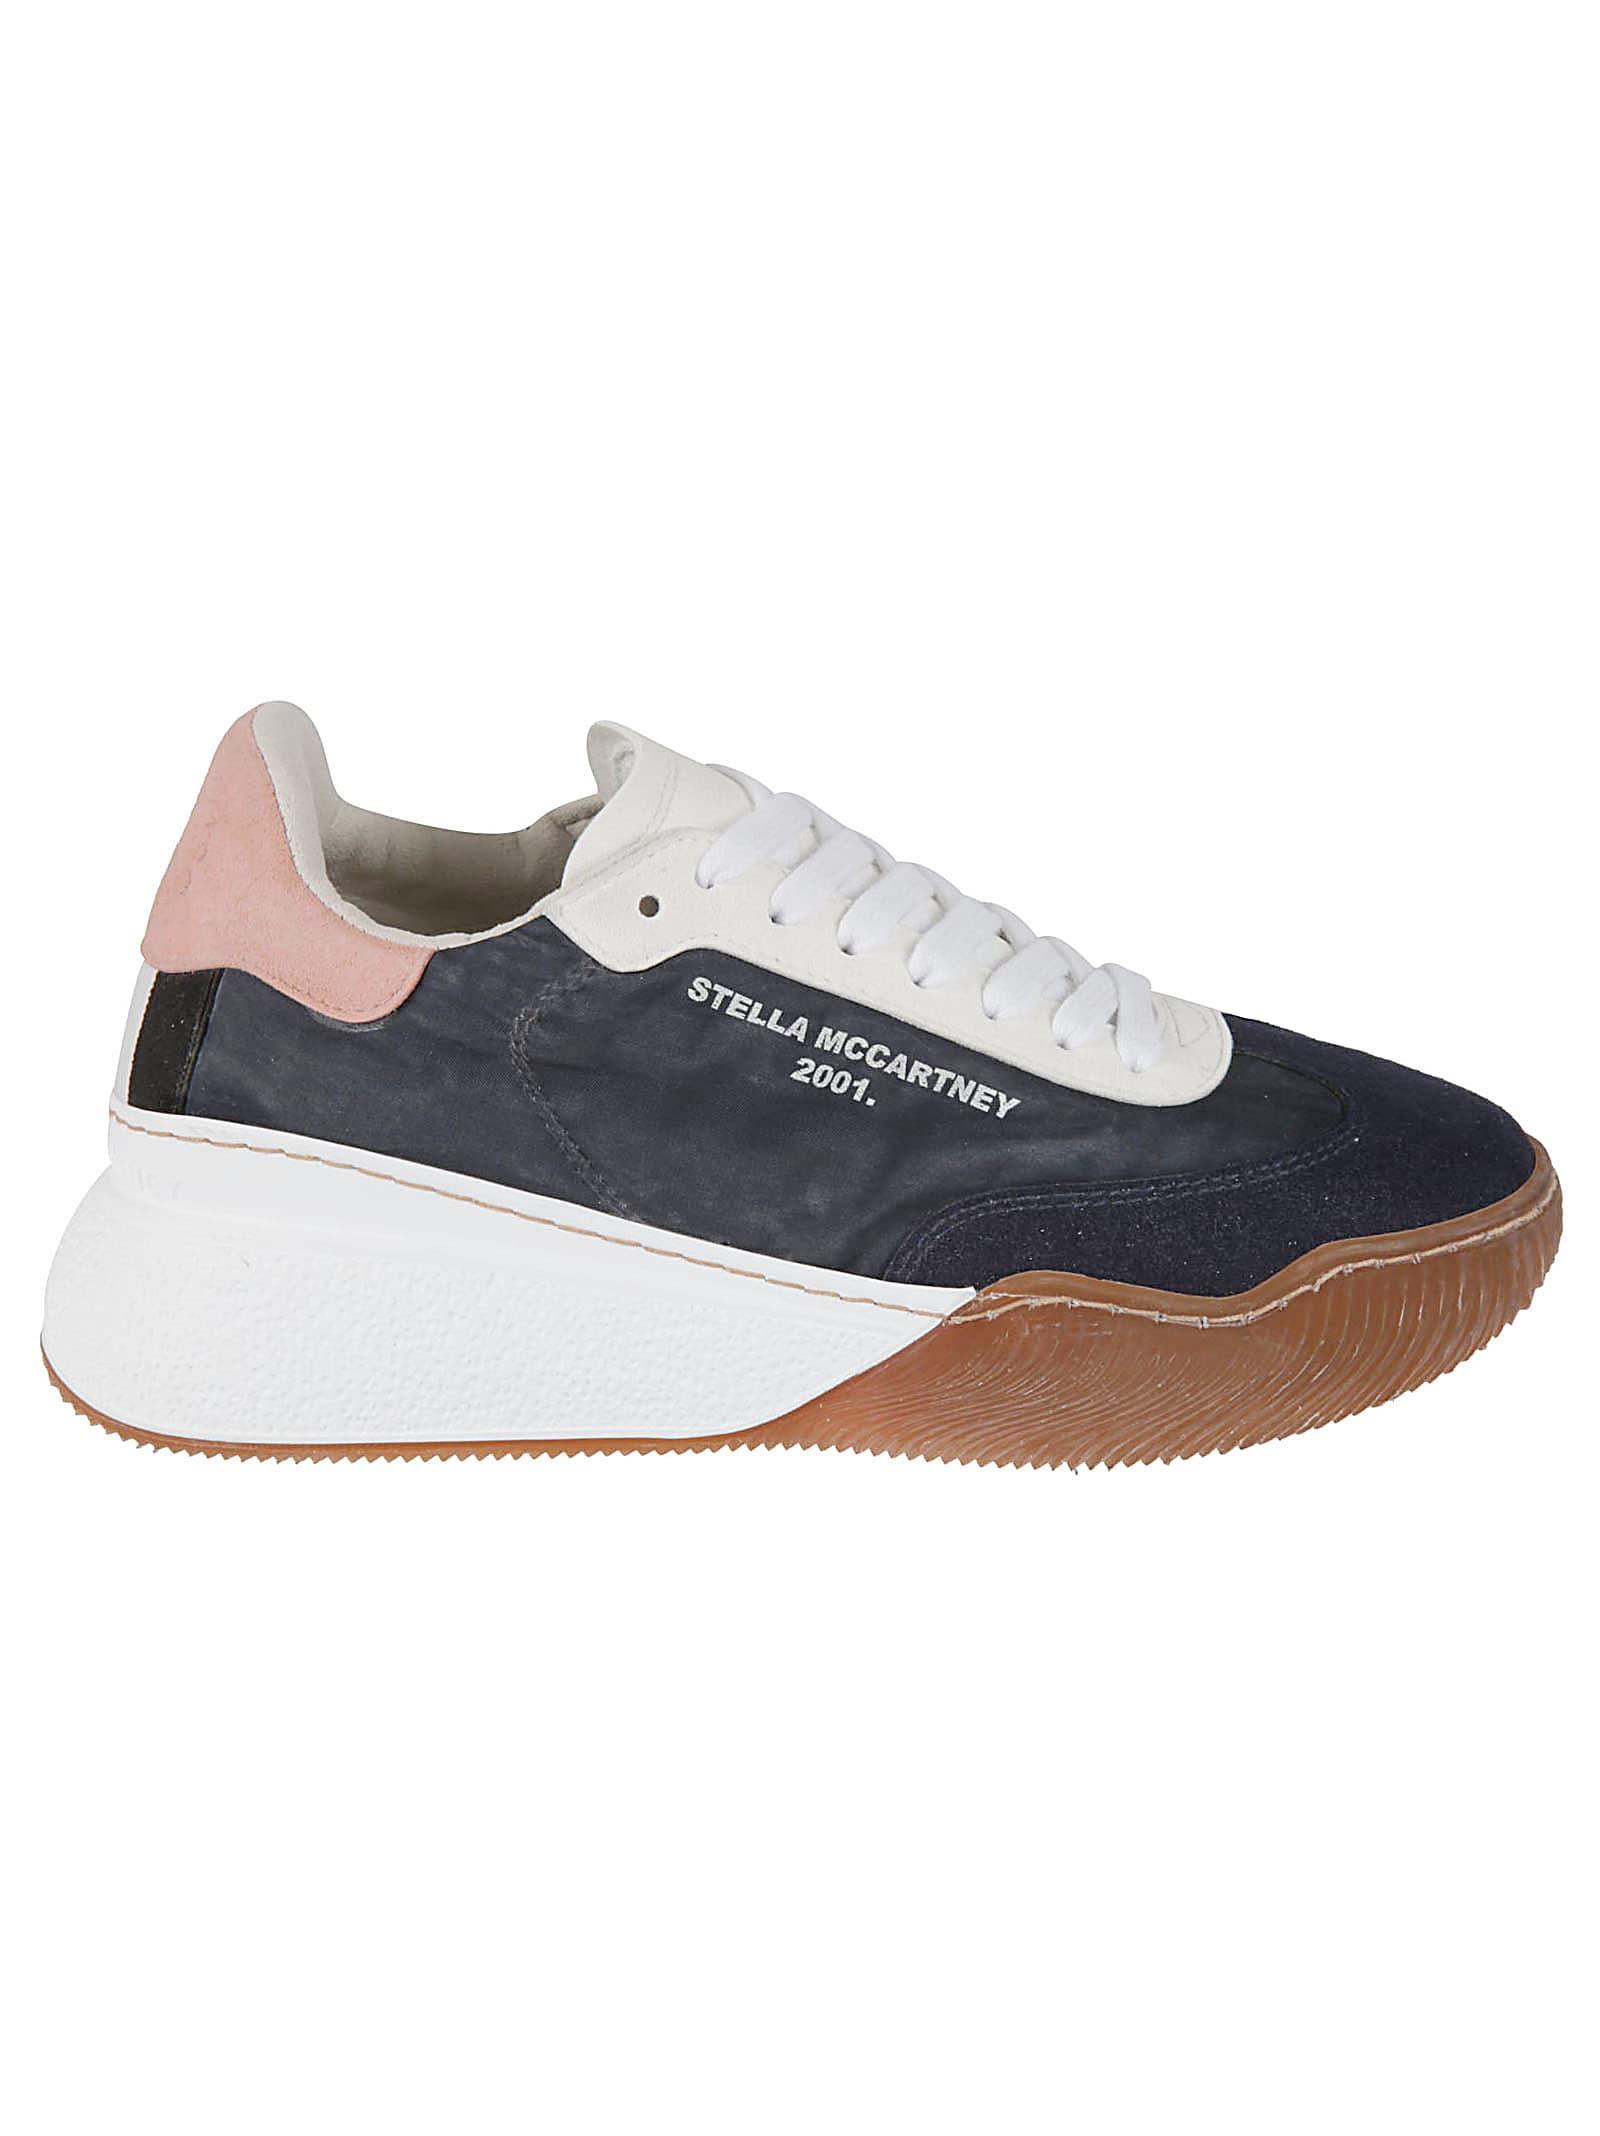 Stella McCartney Sneakers | italist